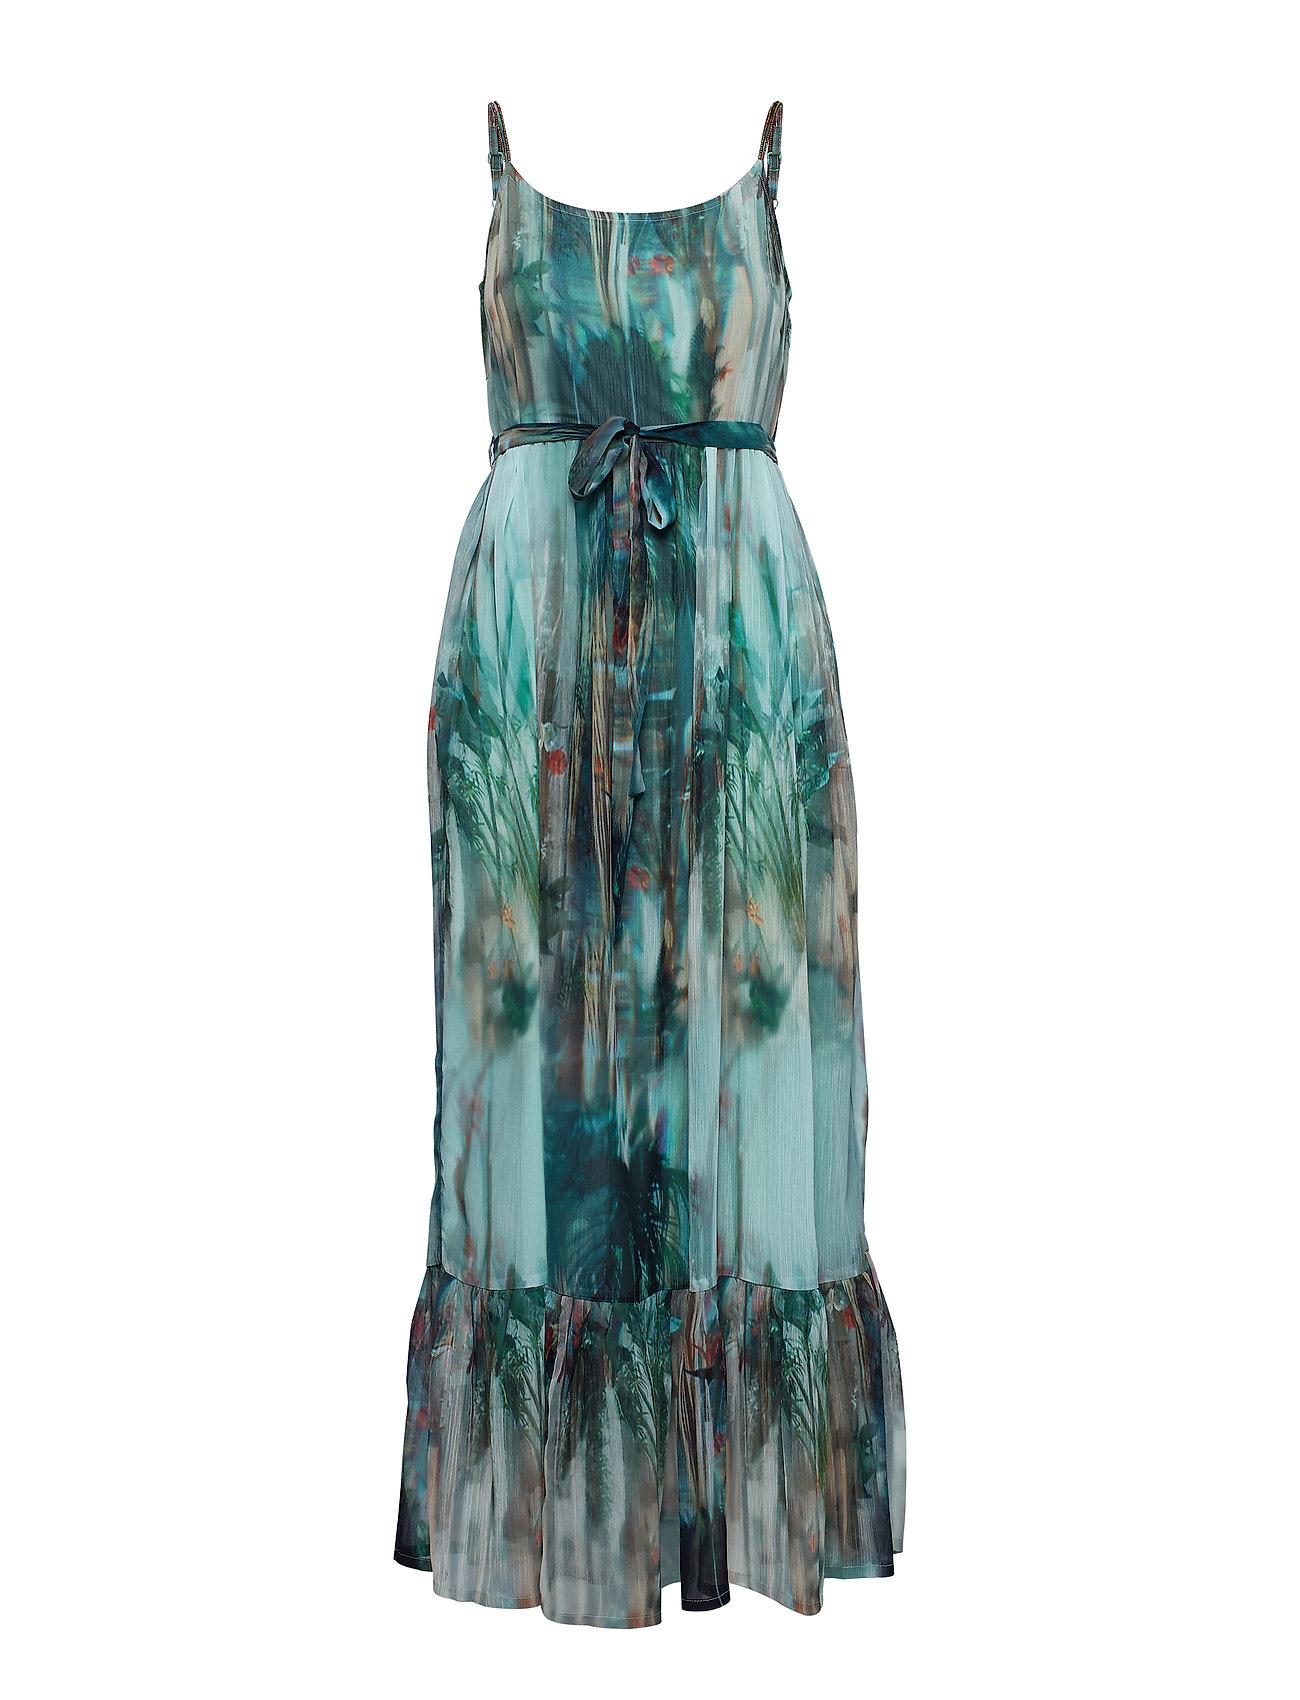 Cream Jeanne Long Dress - MALACHITE GREEN